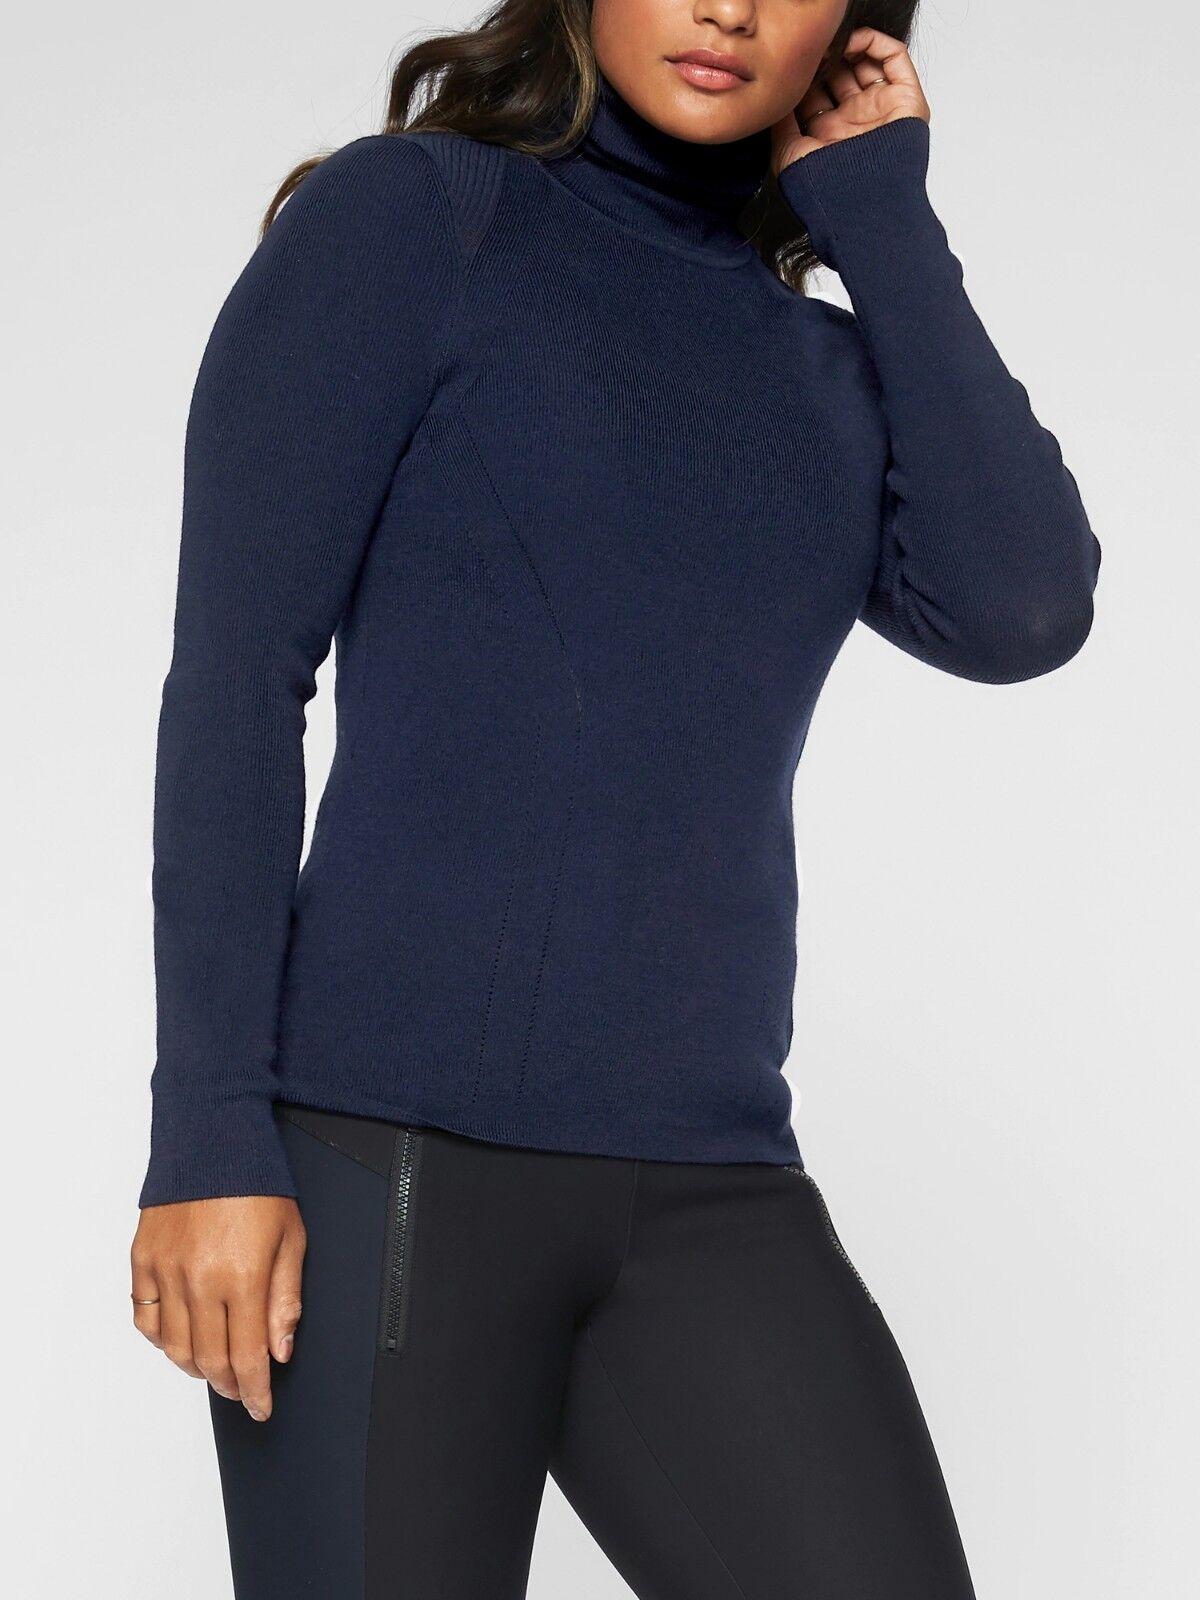 NWT Athleta Futures Turtleneck Sweater Top, Navy Größe XS           N0113